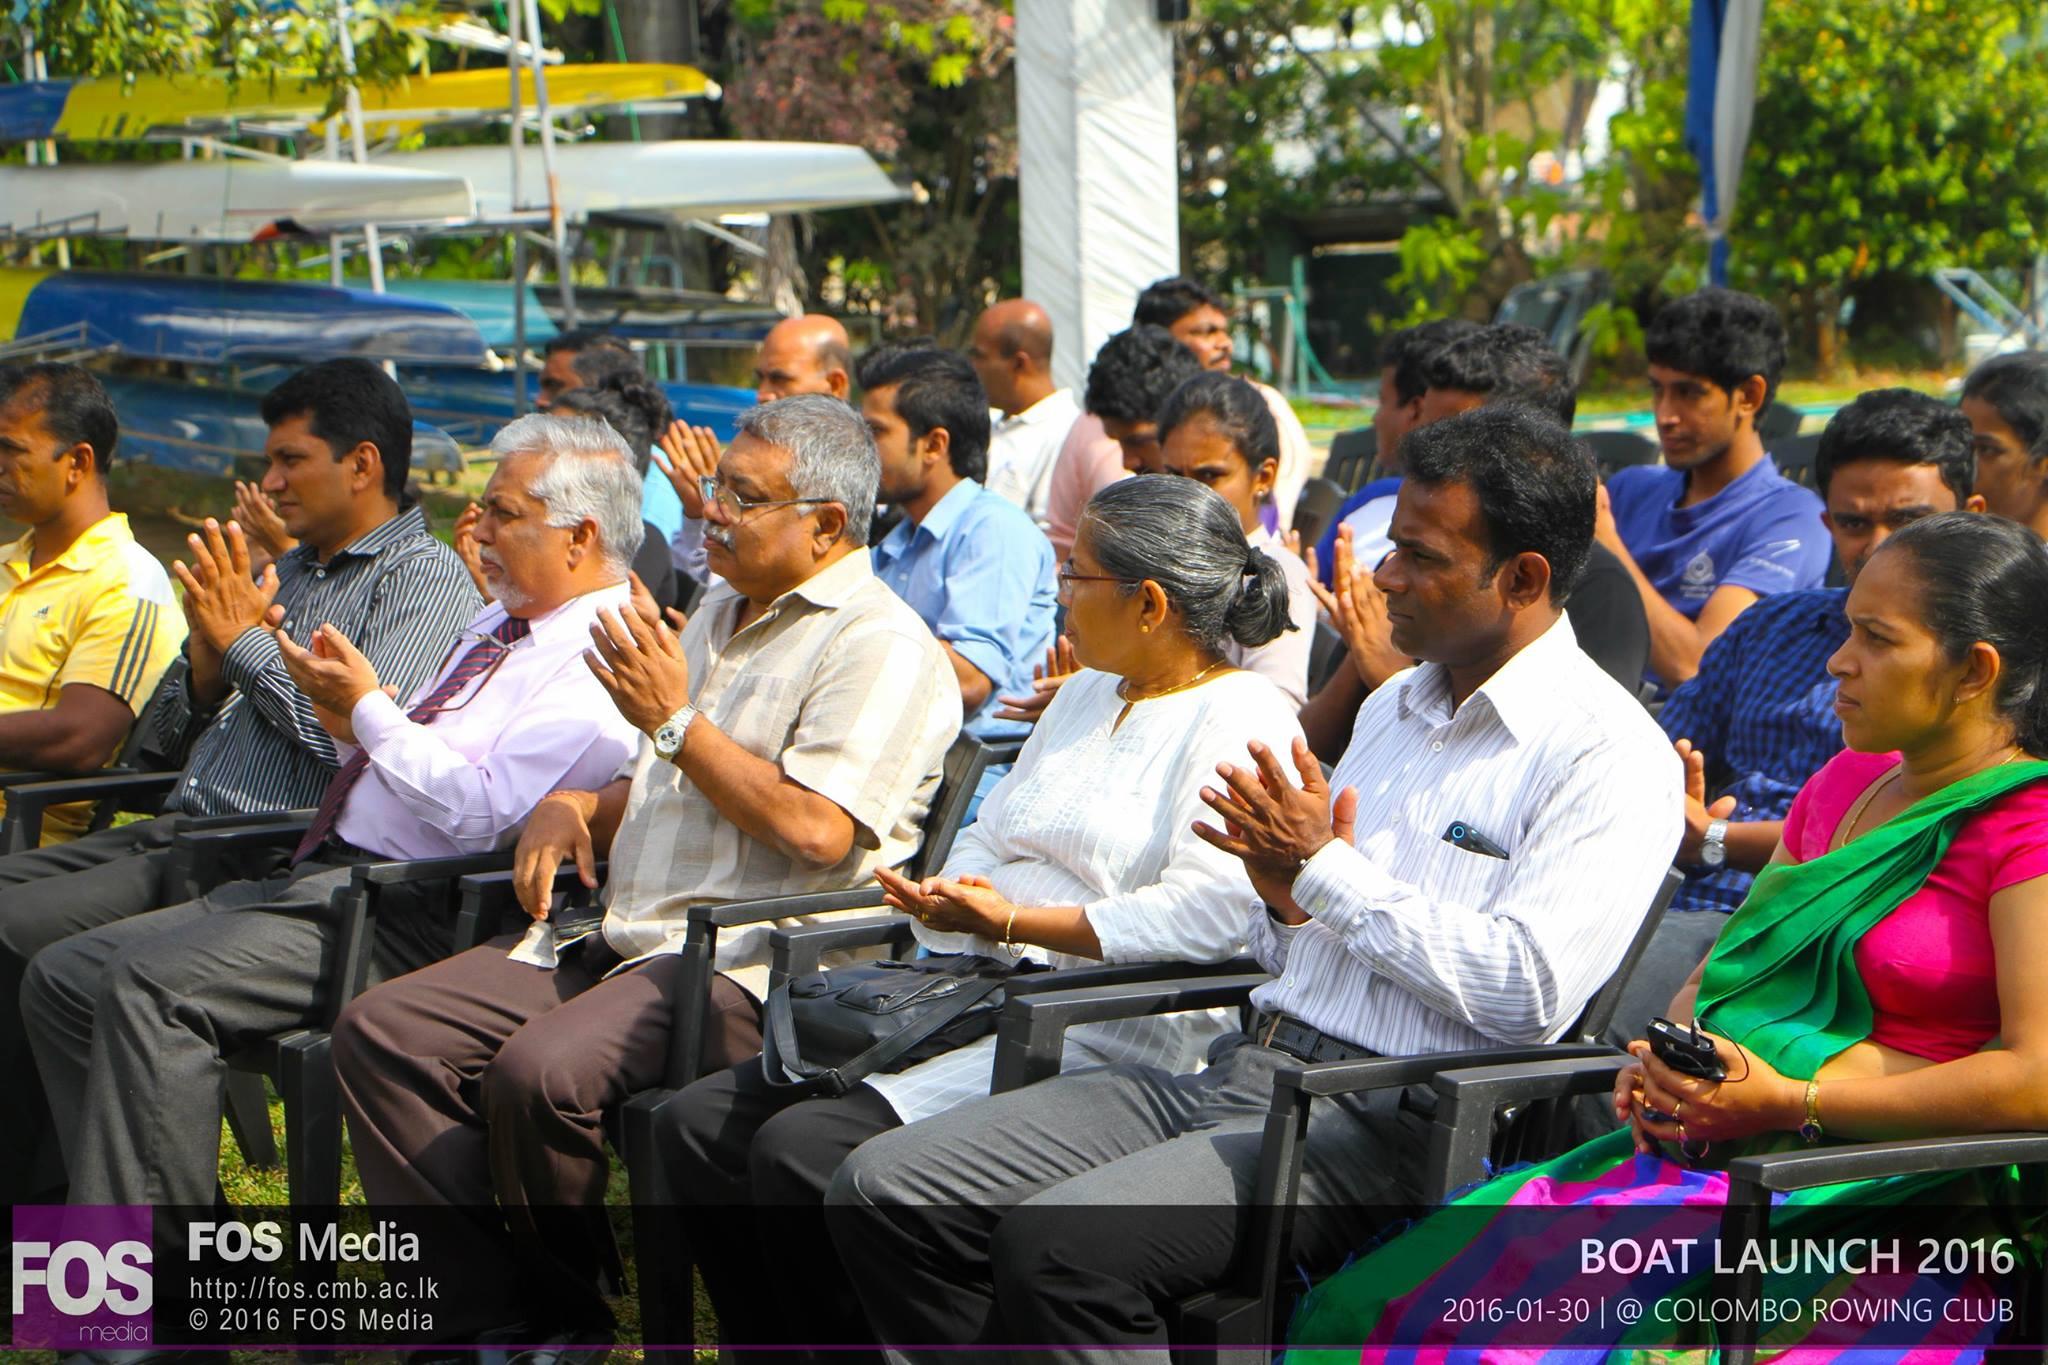 Boat Launch 2016 2